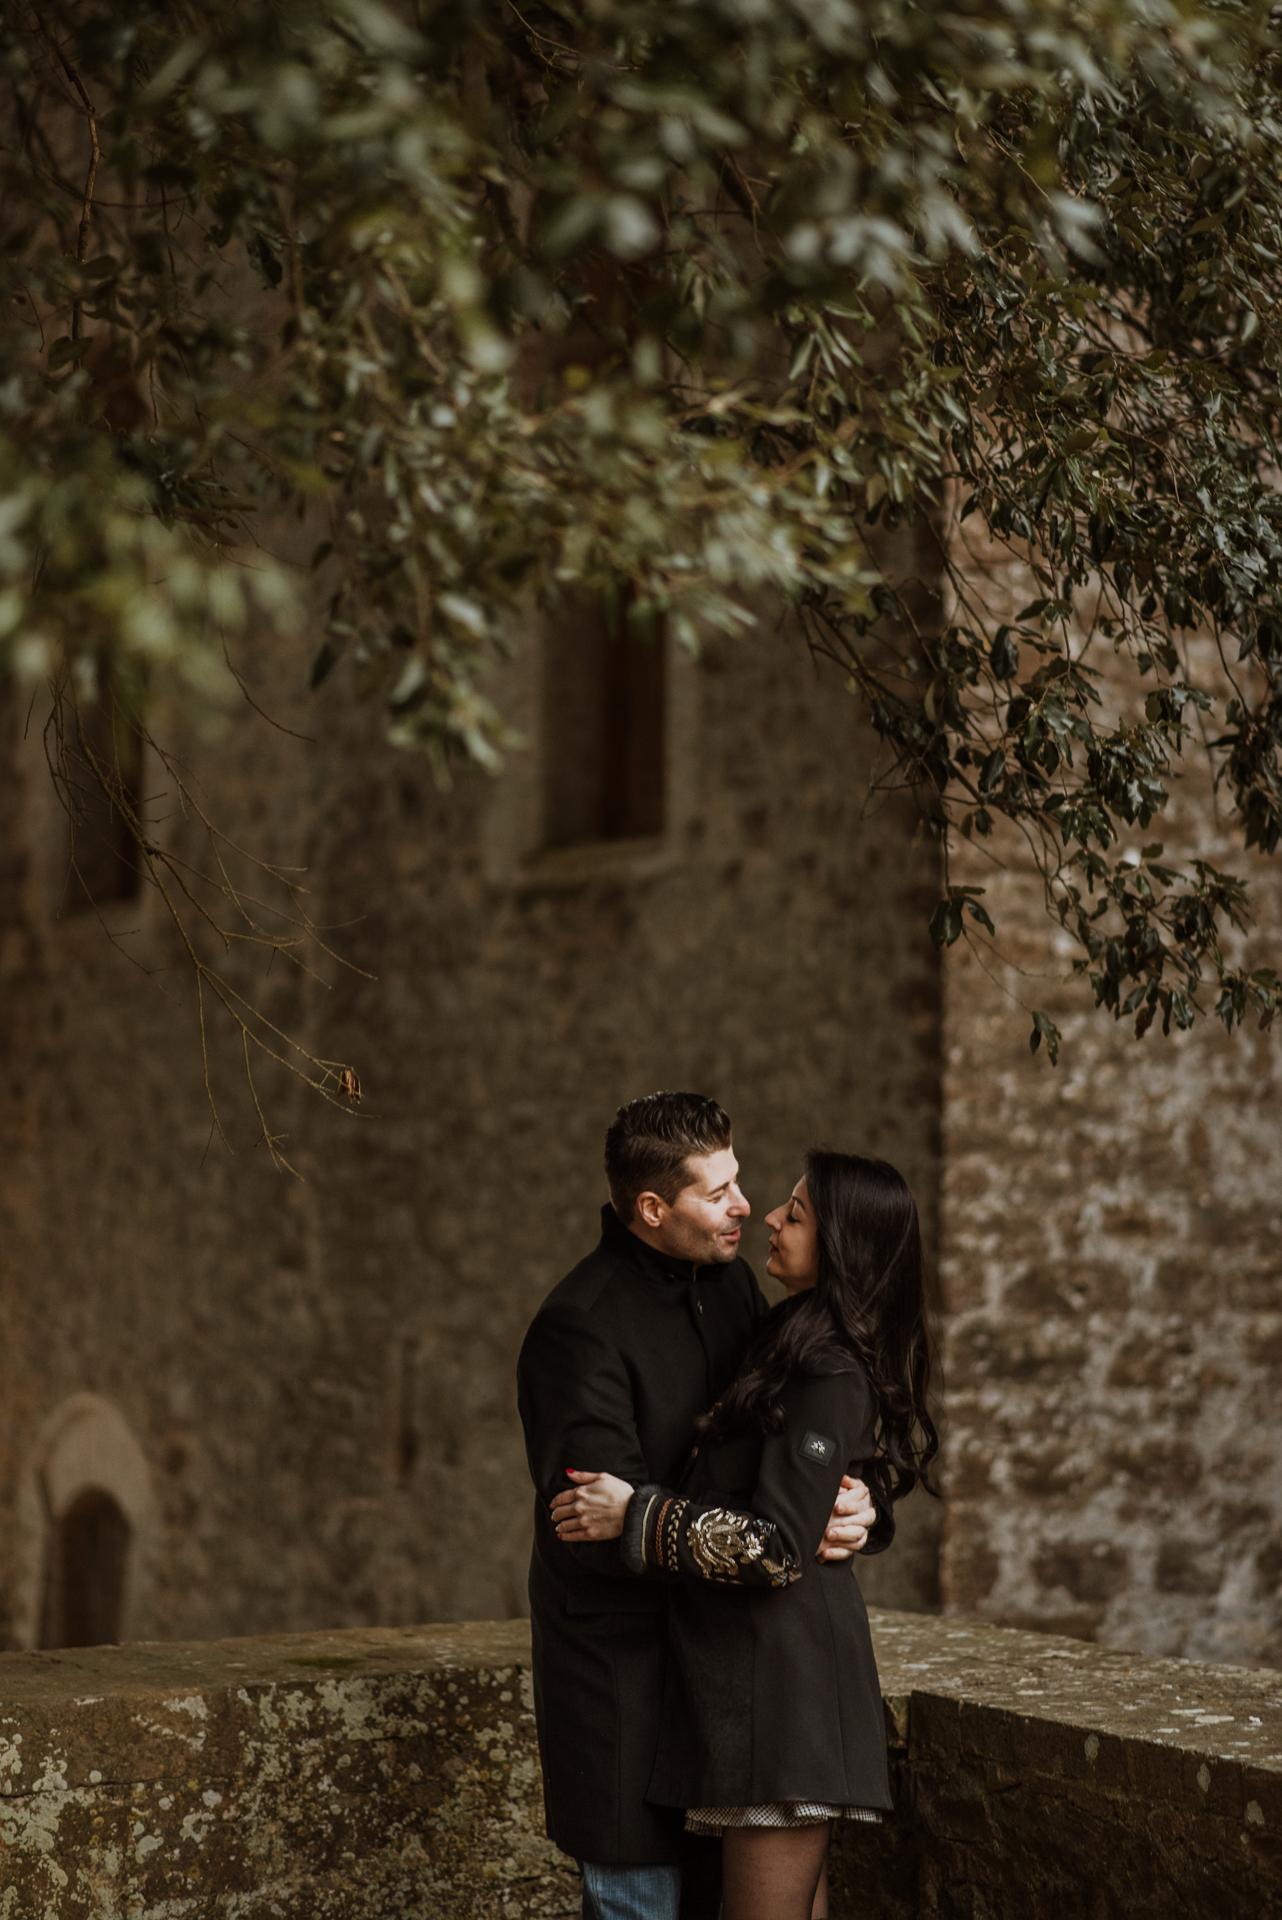 Marco Vegni Engagement Photographer near Montalcino